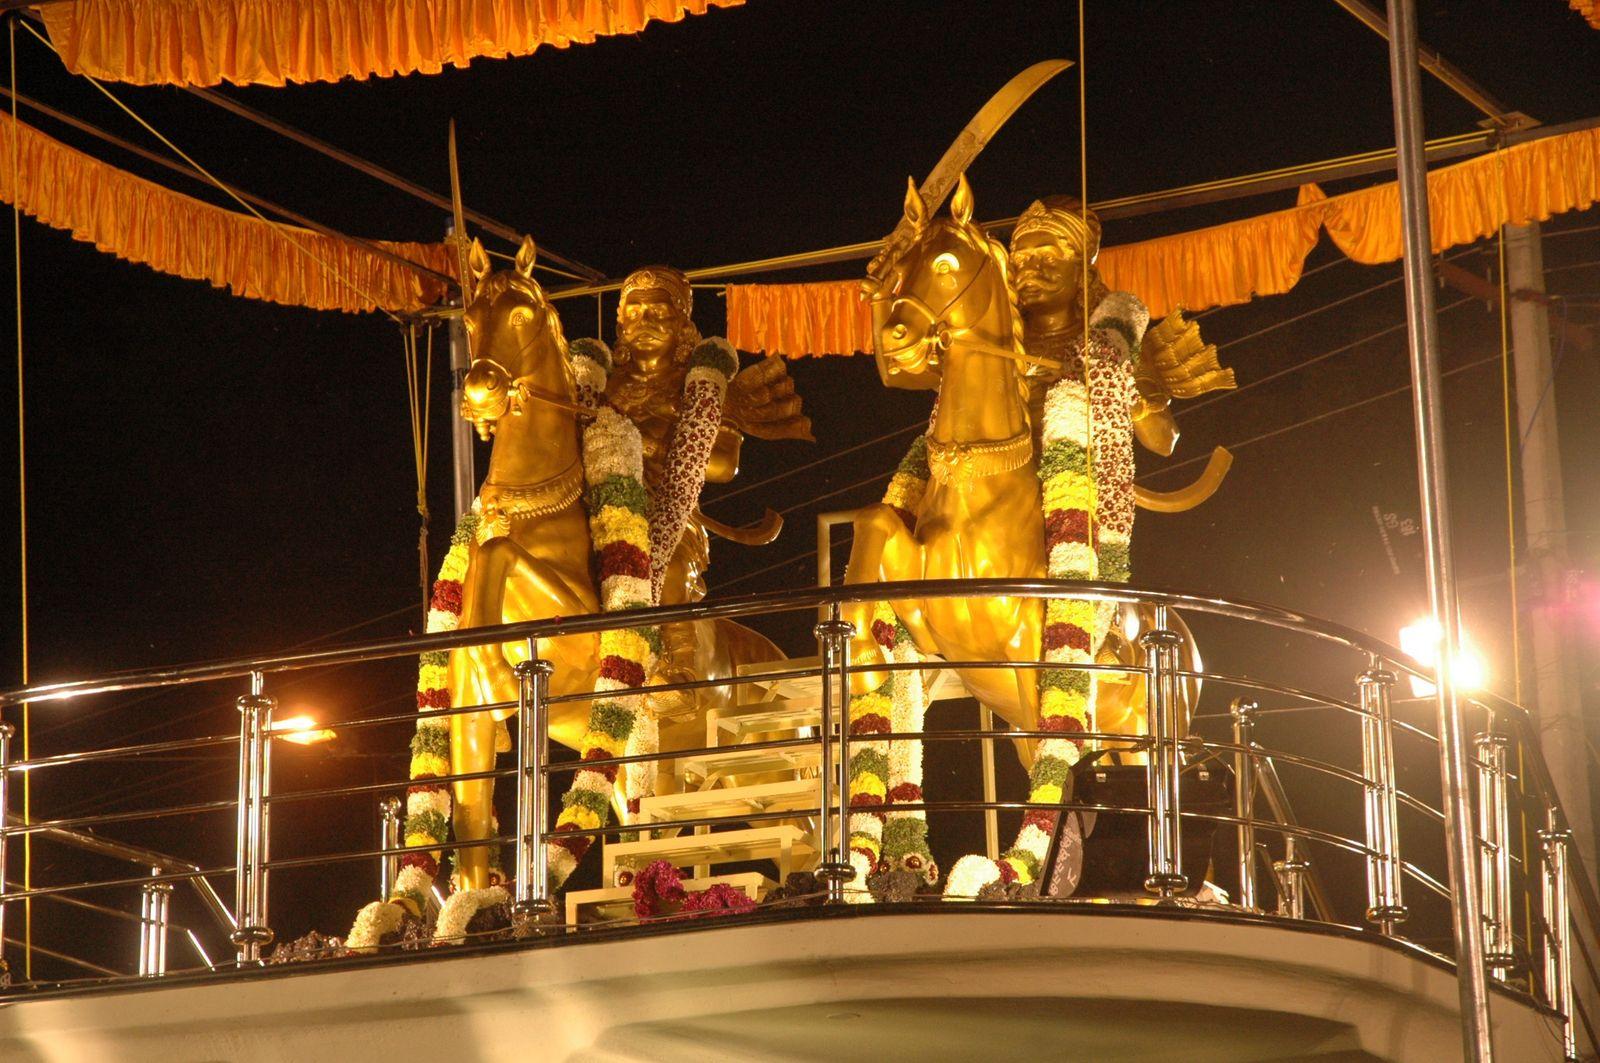 Thevar Maruthu Pandiyar